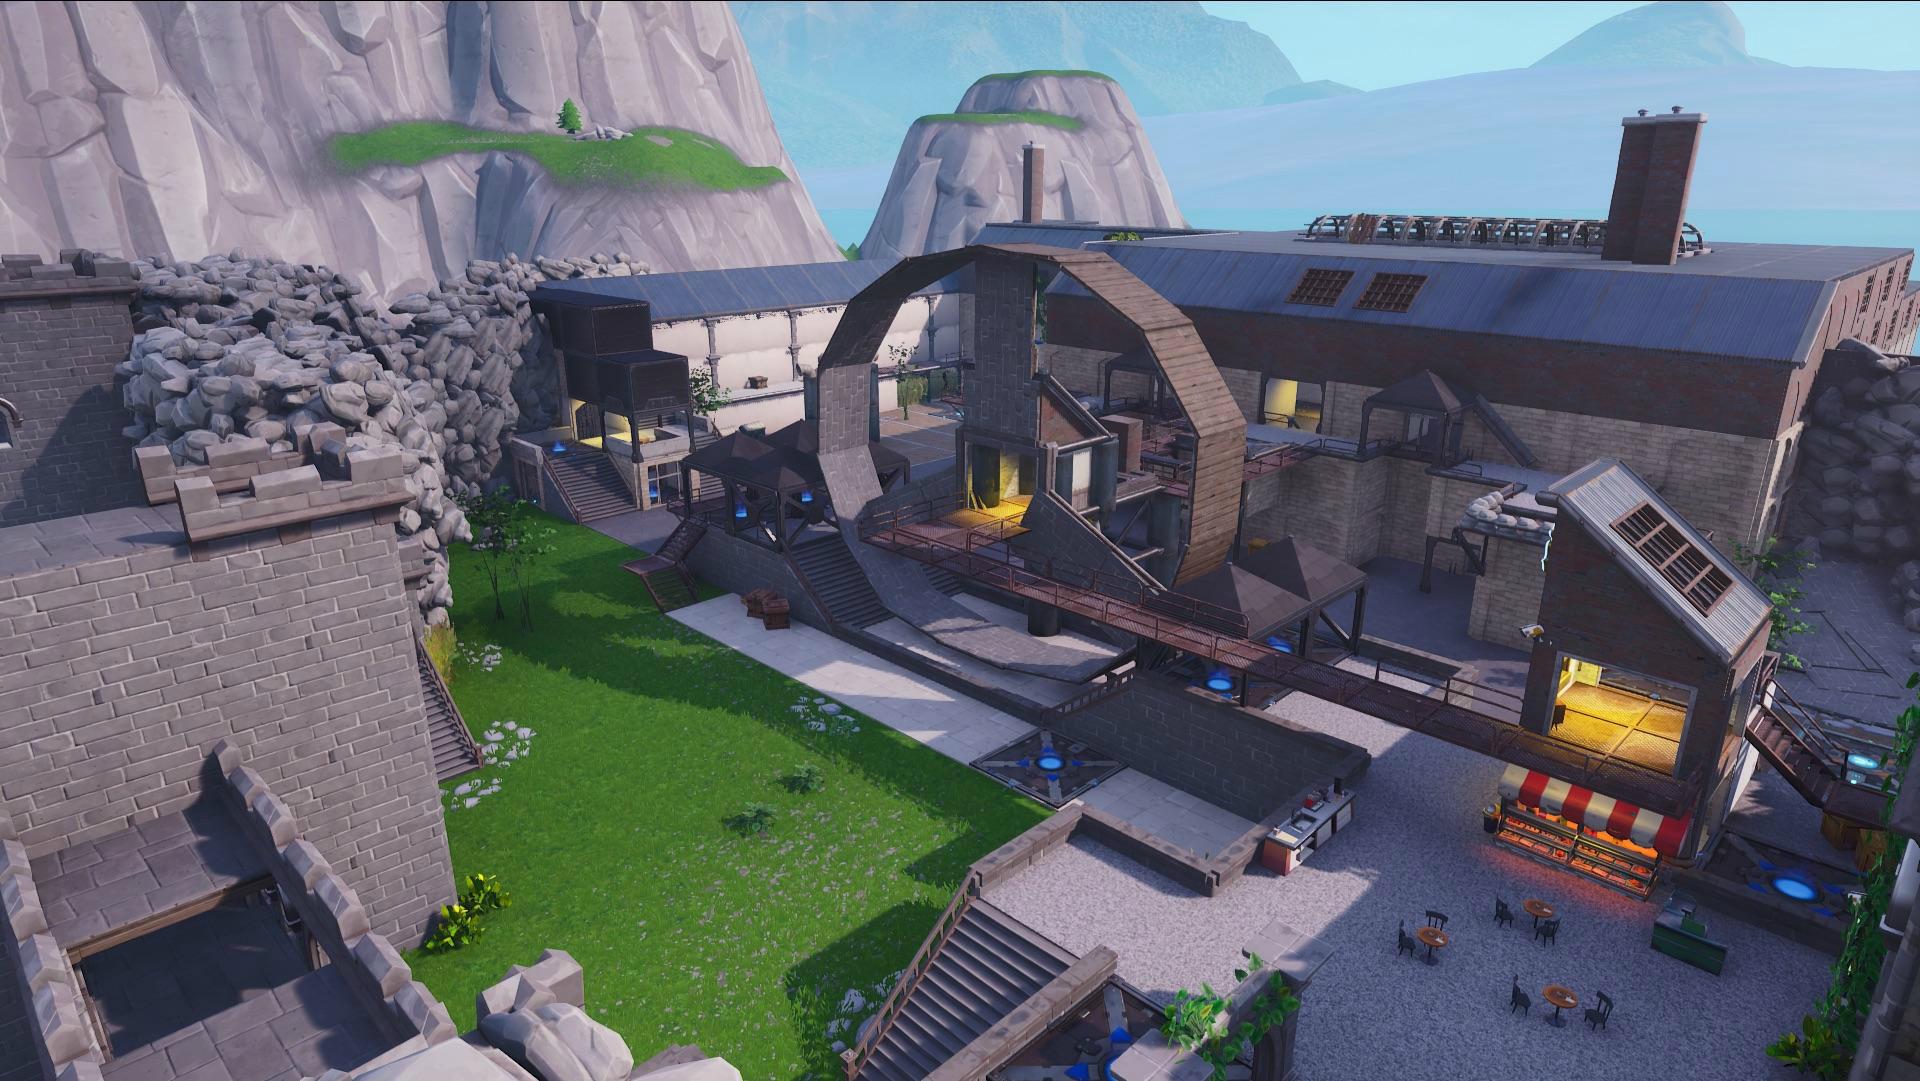 Last Resort Halo 3 Fortnite